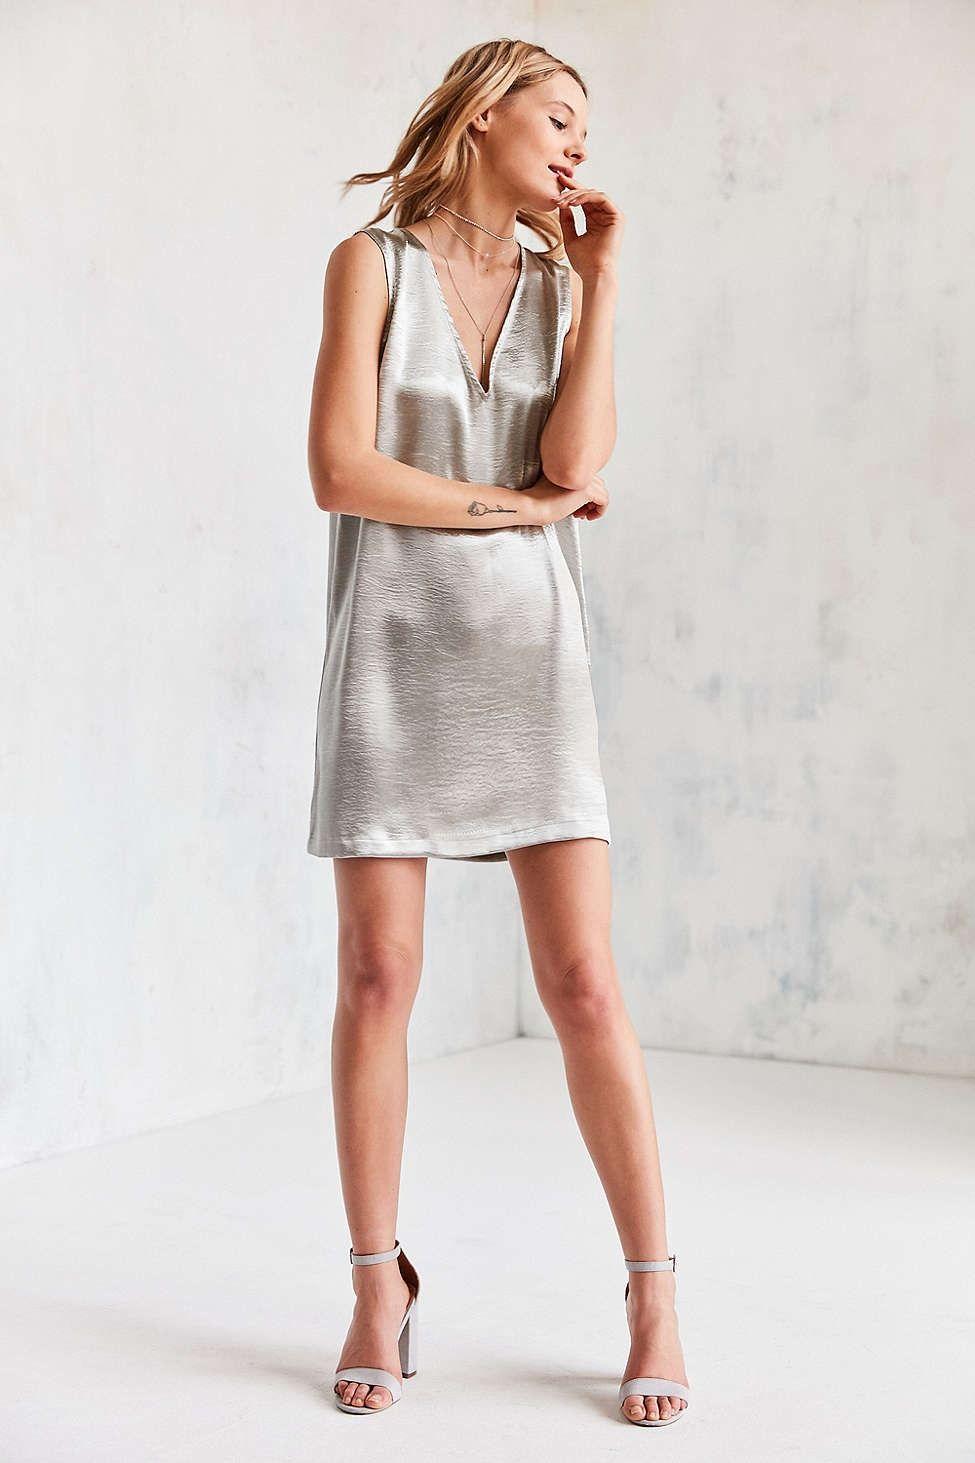 Silence + Noise Deep V Silky Shine Shift Dress - Urban Outfitters